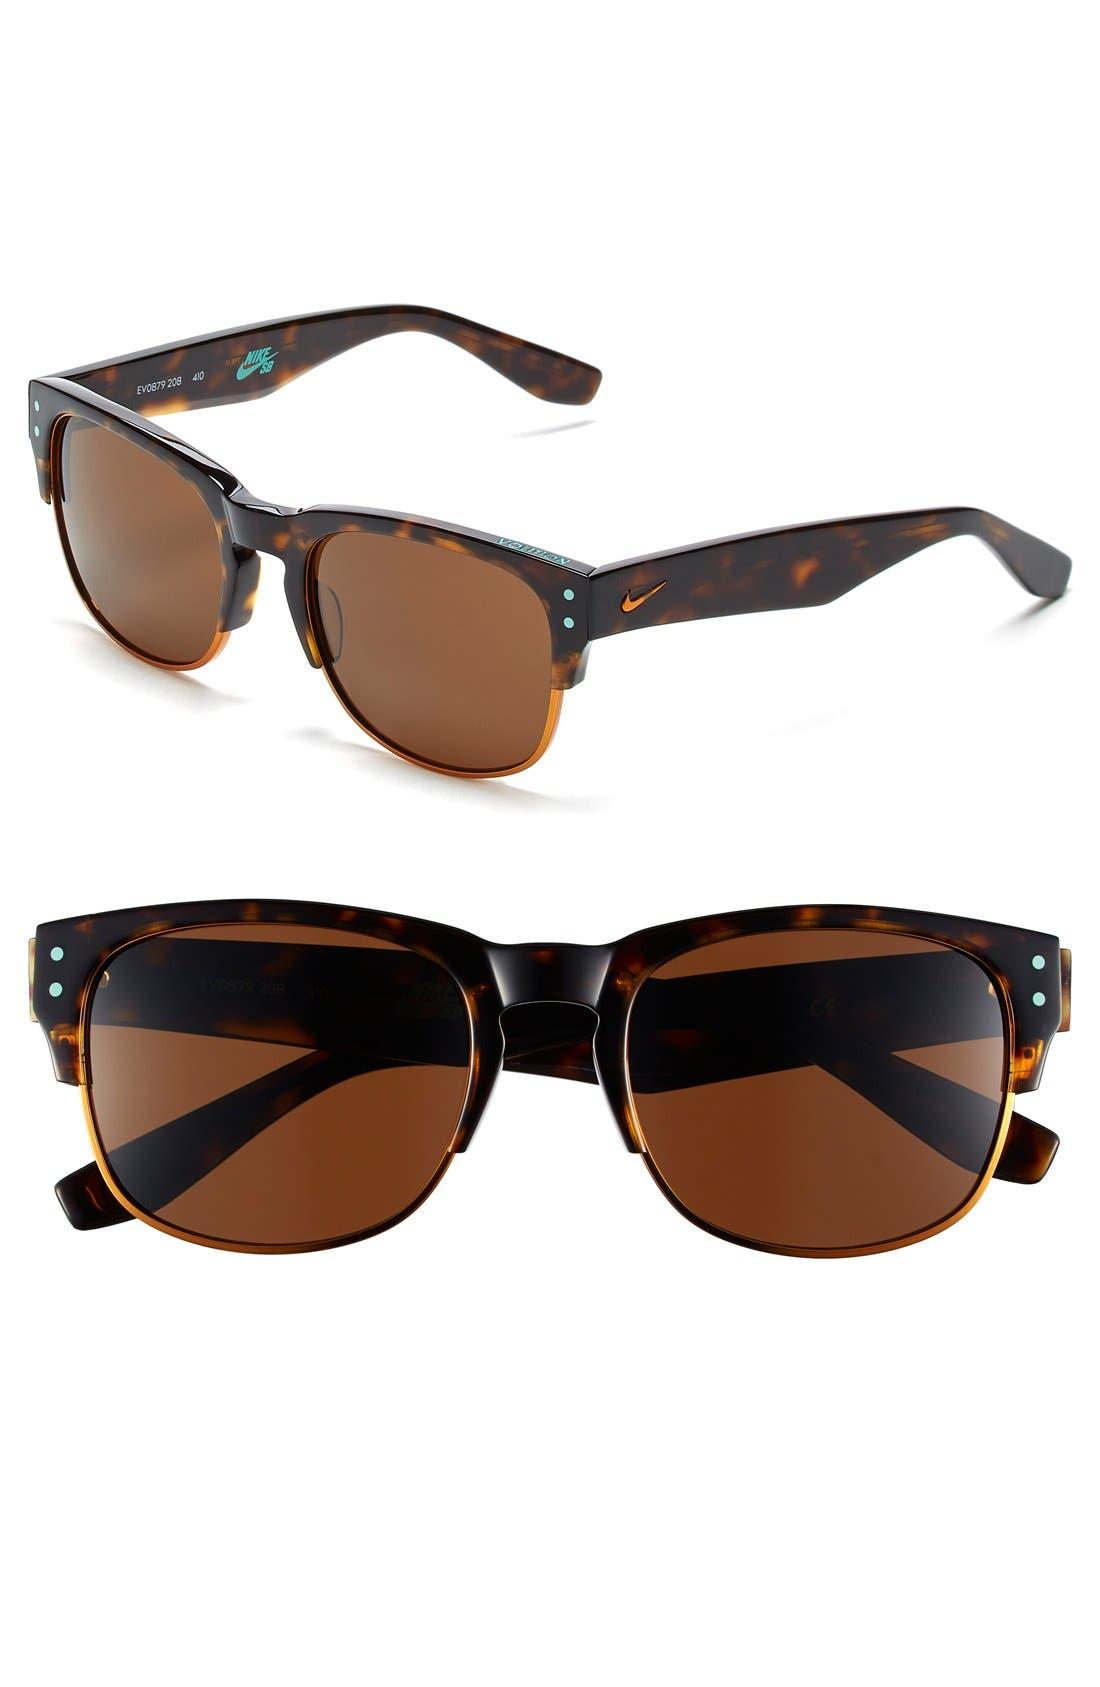 Volition 54mm Sunglasses,                         Main,                         color, Tortoise/ Copper Flash